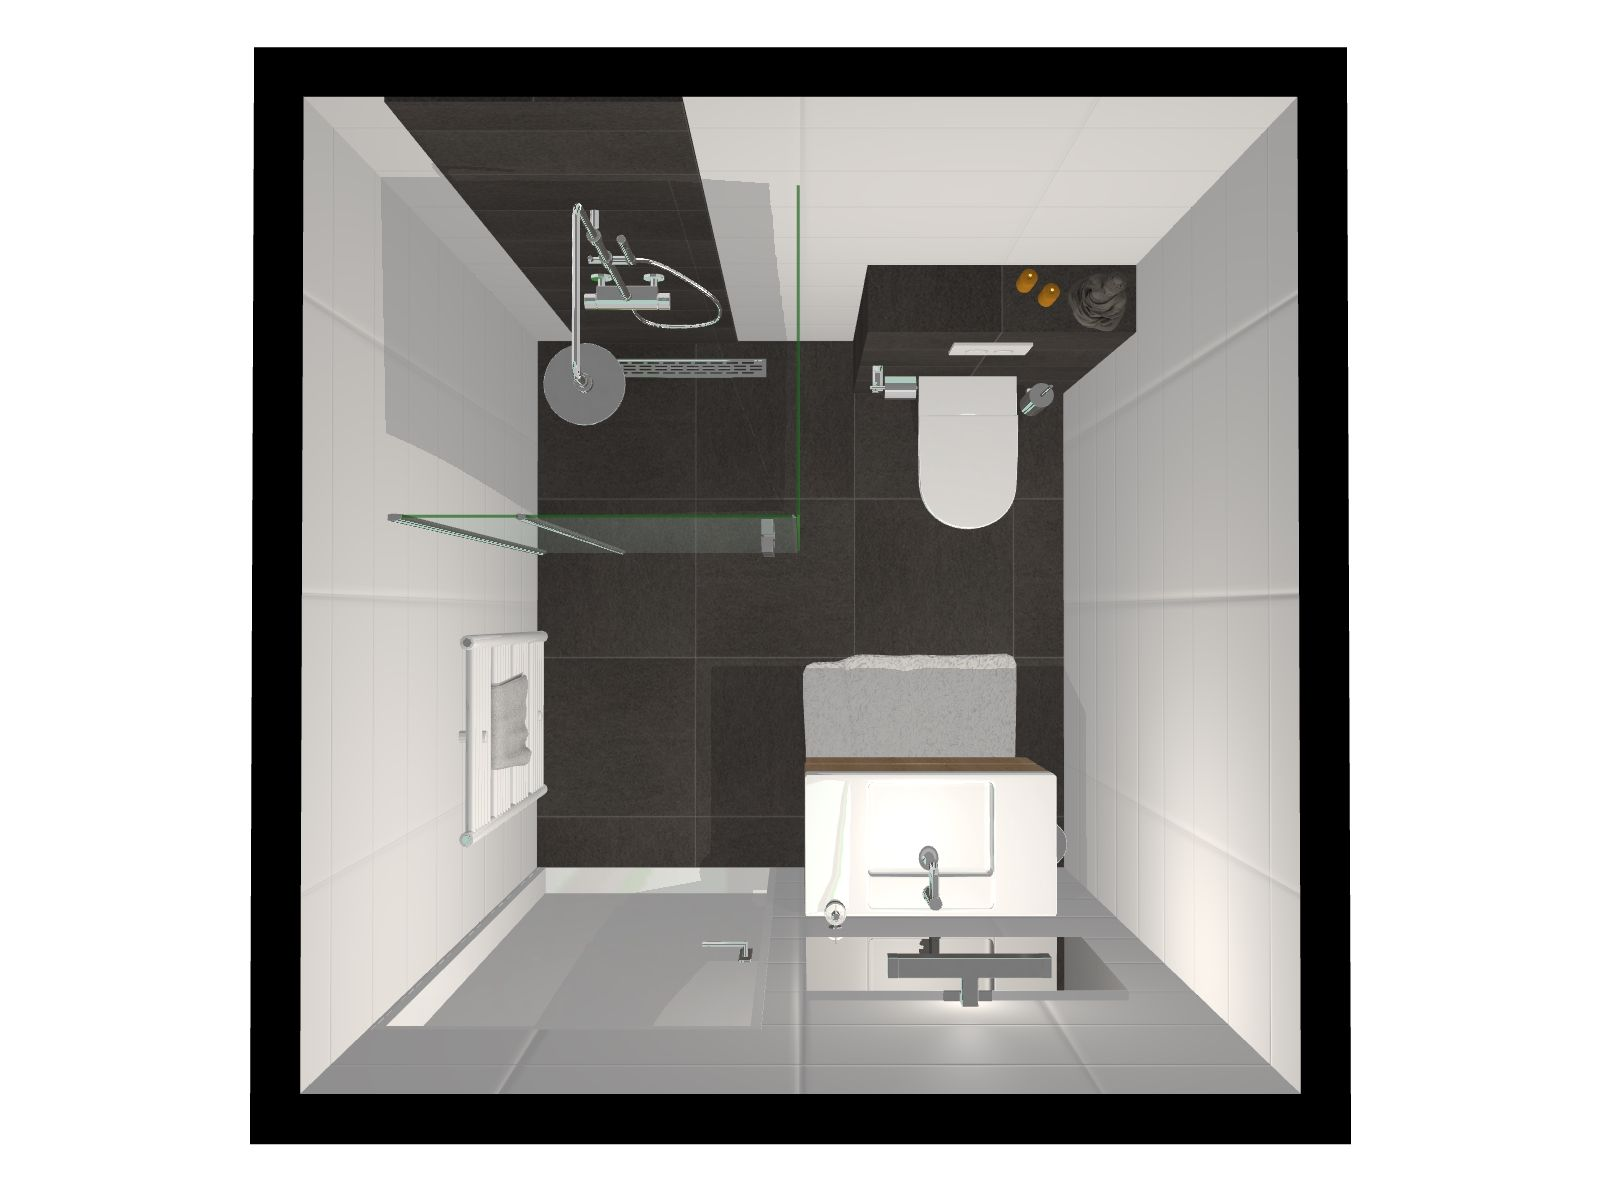 Ikea Badkamer Marktplaats ~ standaard badkamer boven aanzicht standaard badkamer met ligbad